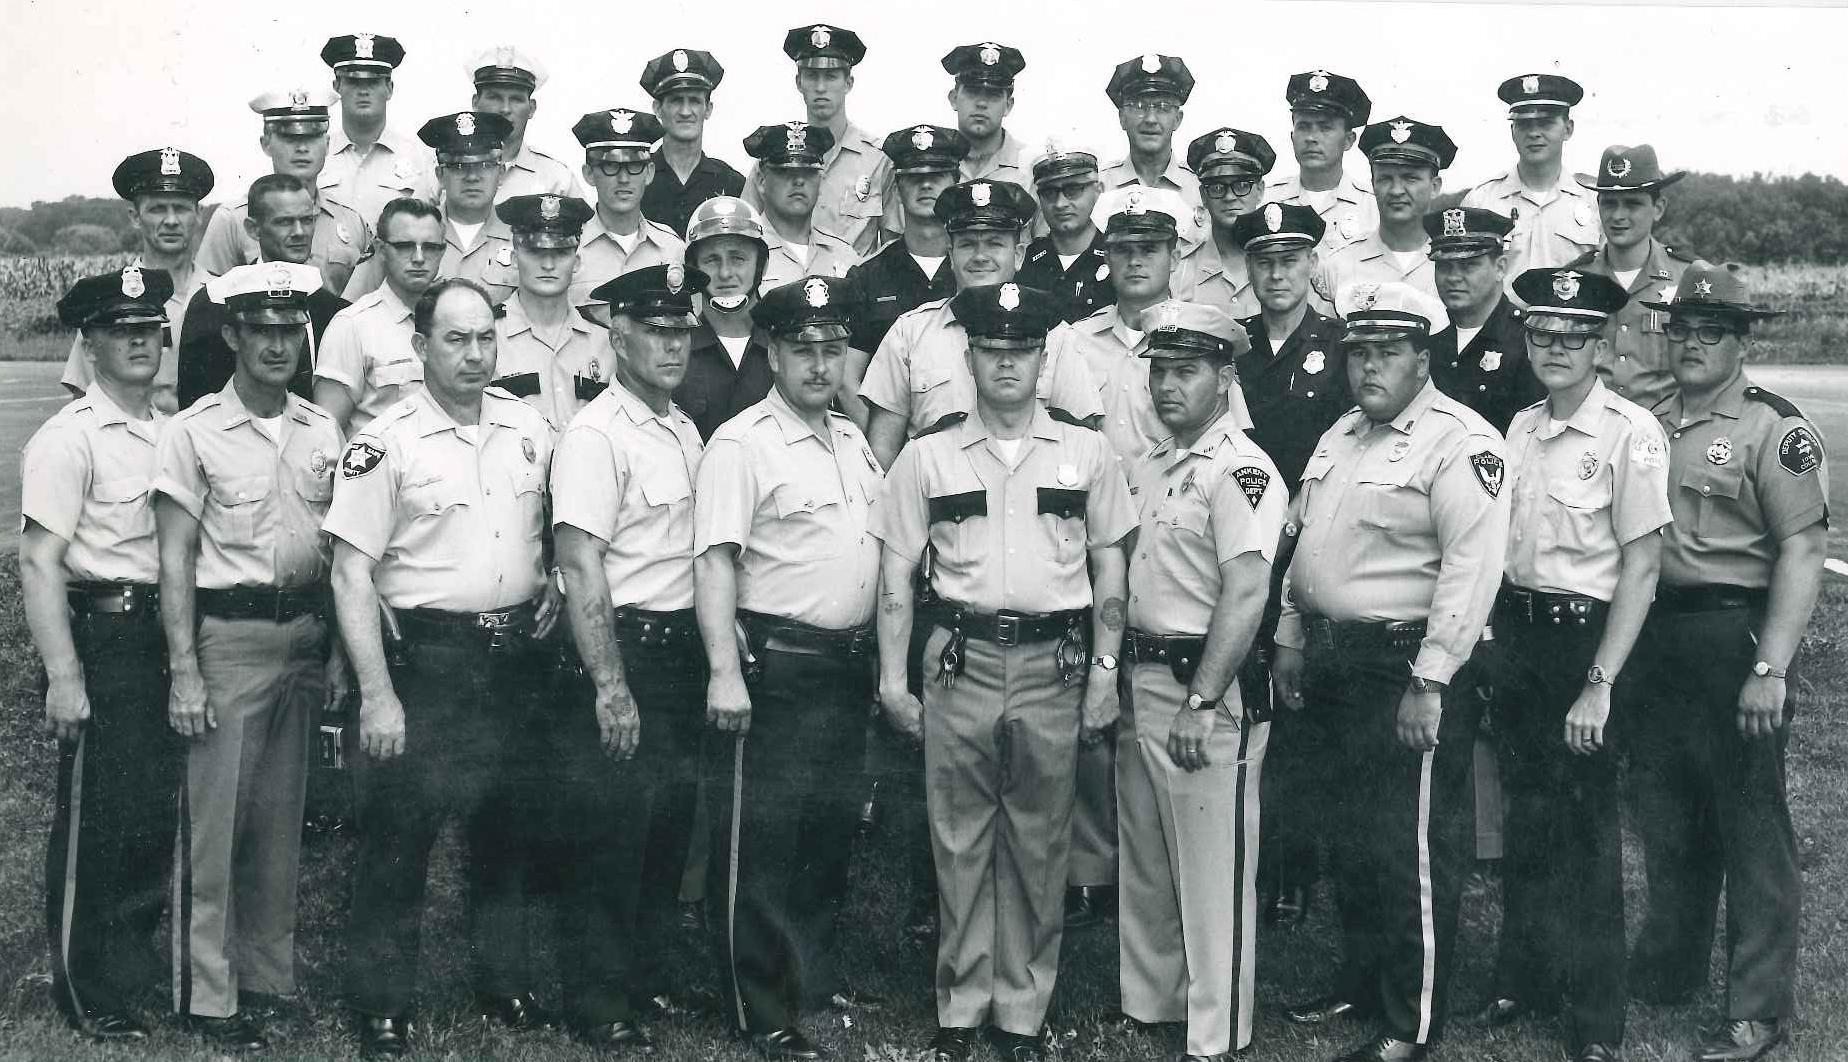 1968 – ILEA Basic Academy Class 001